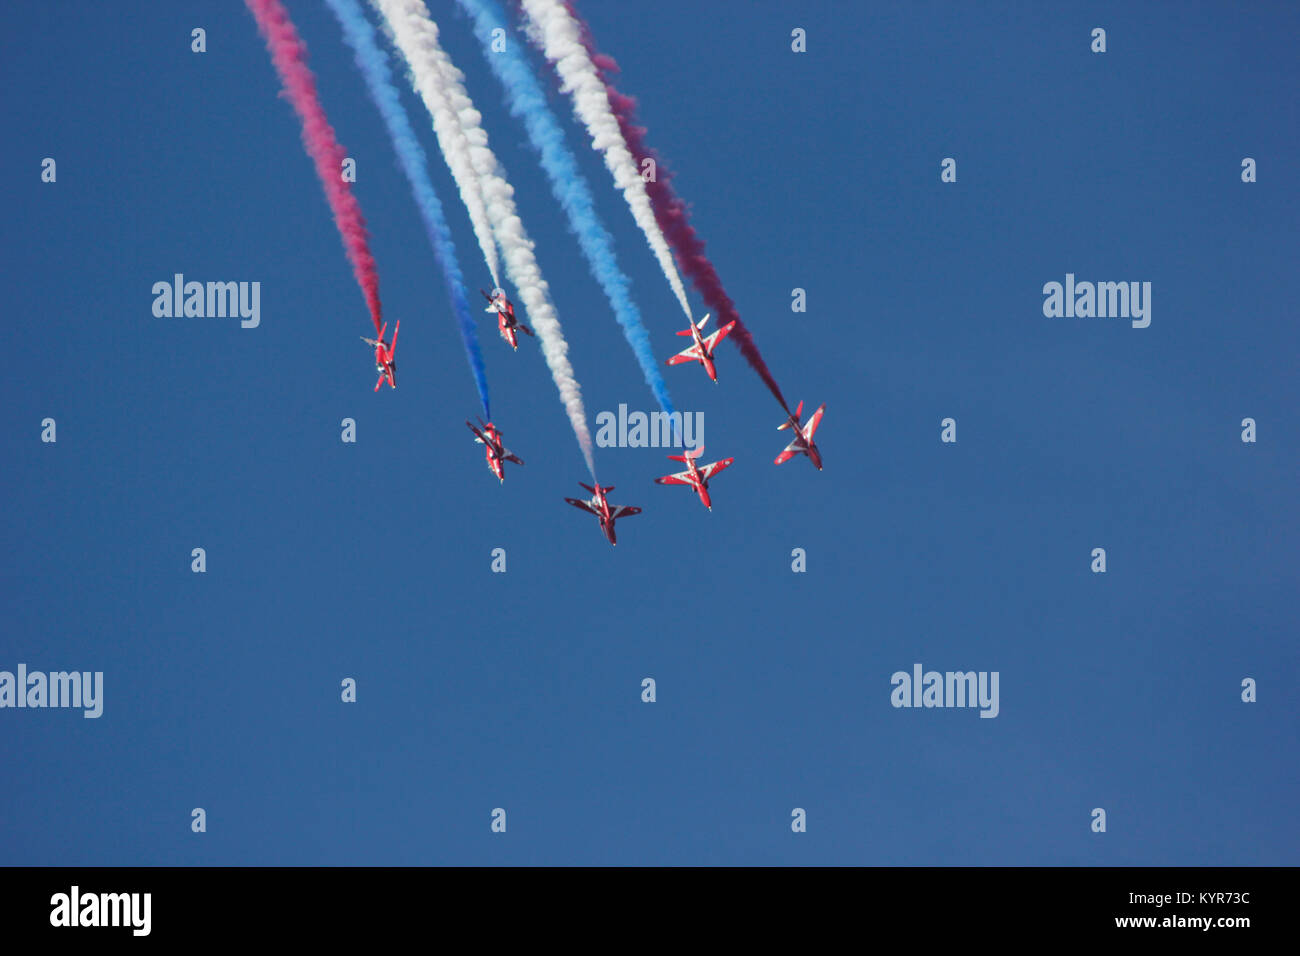 Red Arrows Display at Farnborough Airshow 2014 - Stock Image